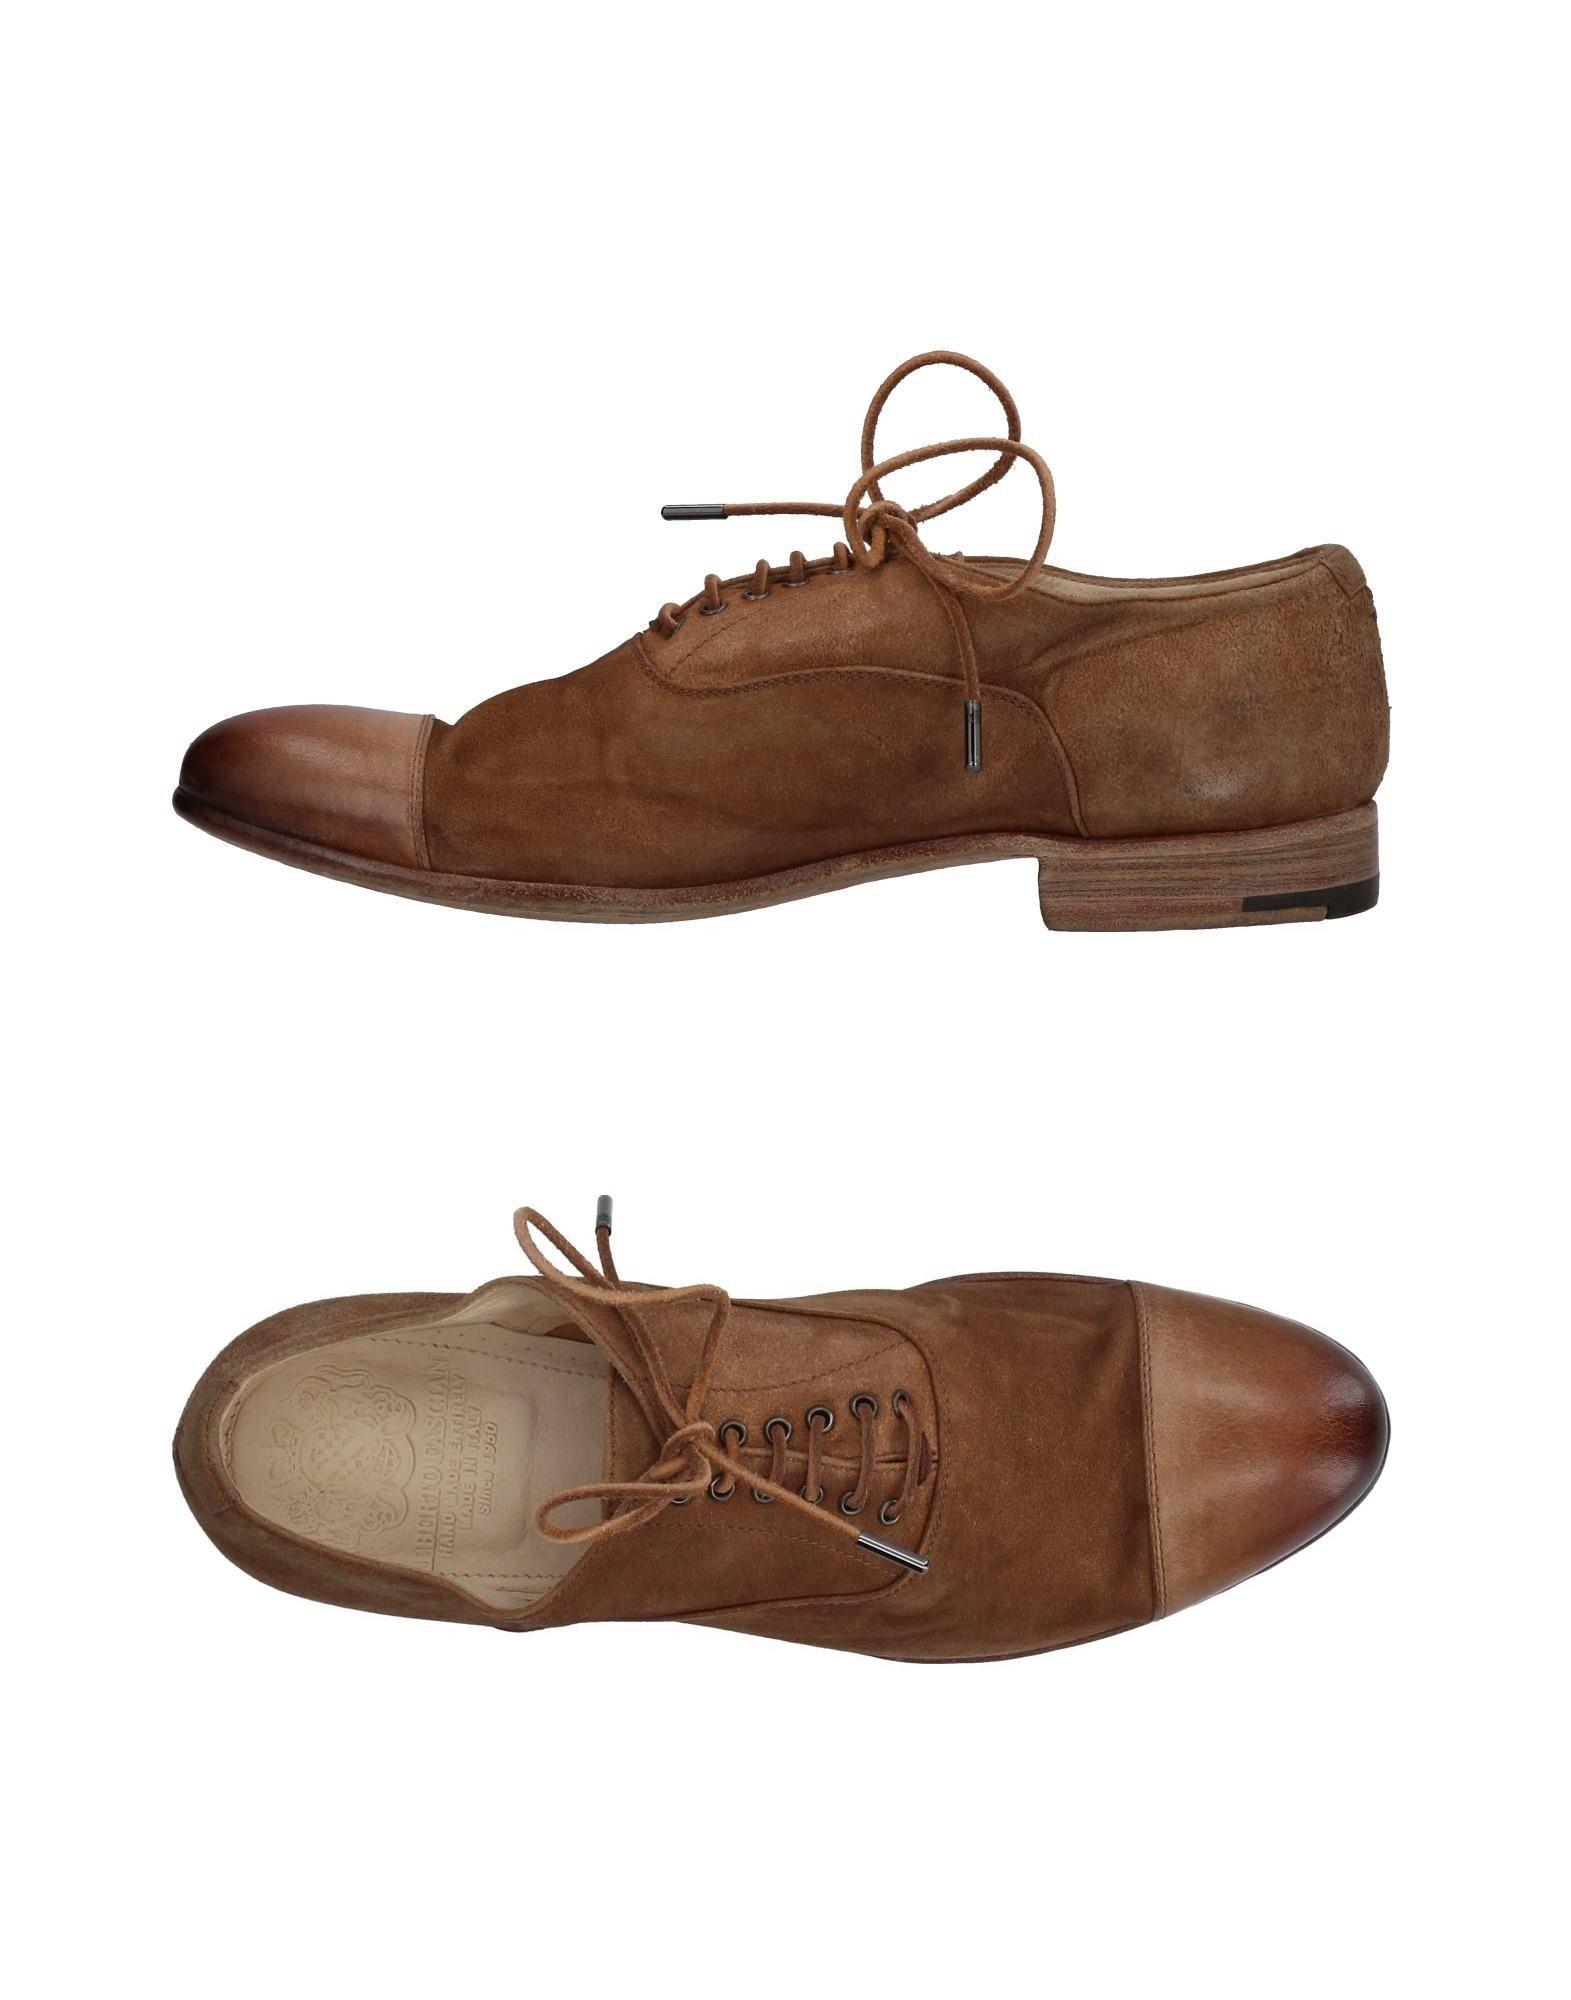 Alberto Fasciani Schnürschuhe Damen  11386600OW Gute Qualität beliebte Schuhe